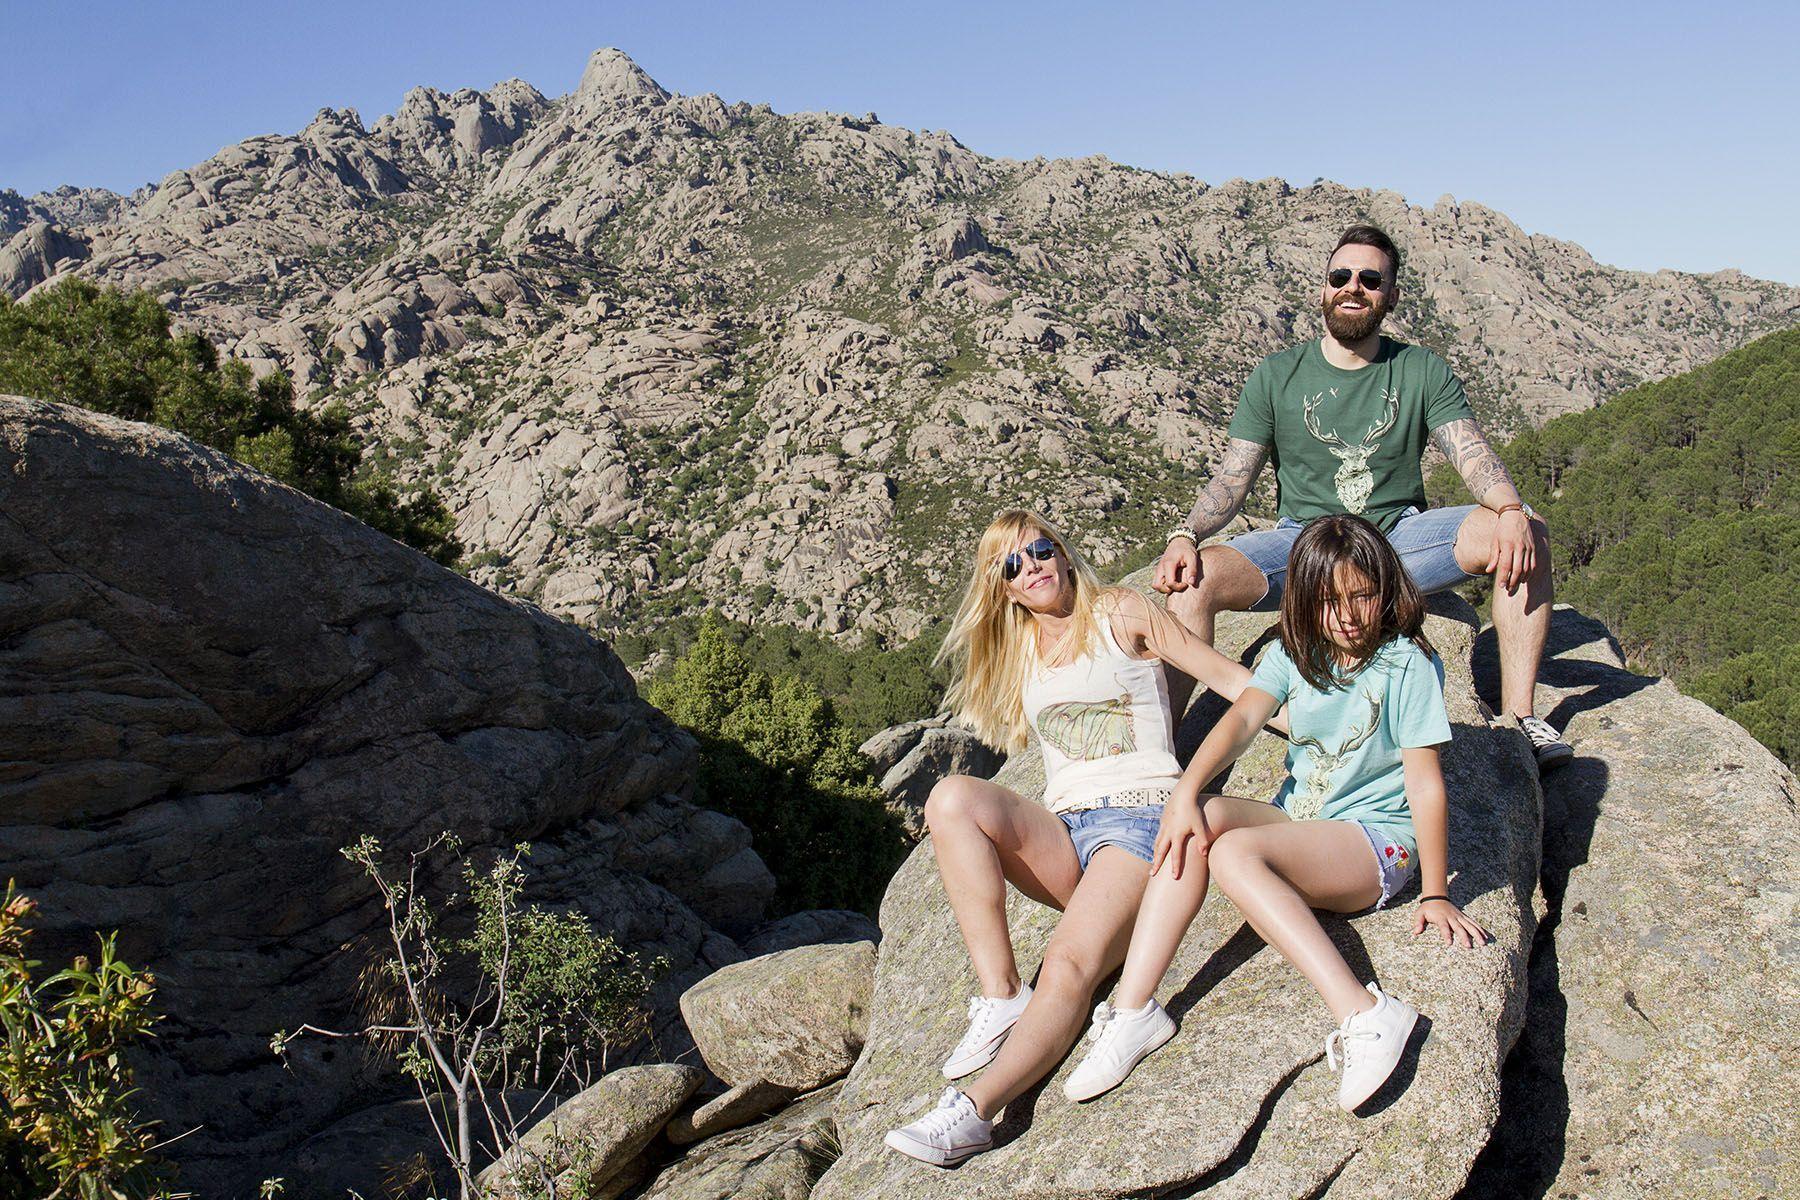 sirem wild-coleccion nature lover-moda sostenible-ciervo-mariposa